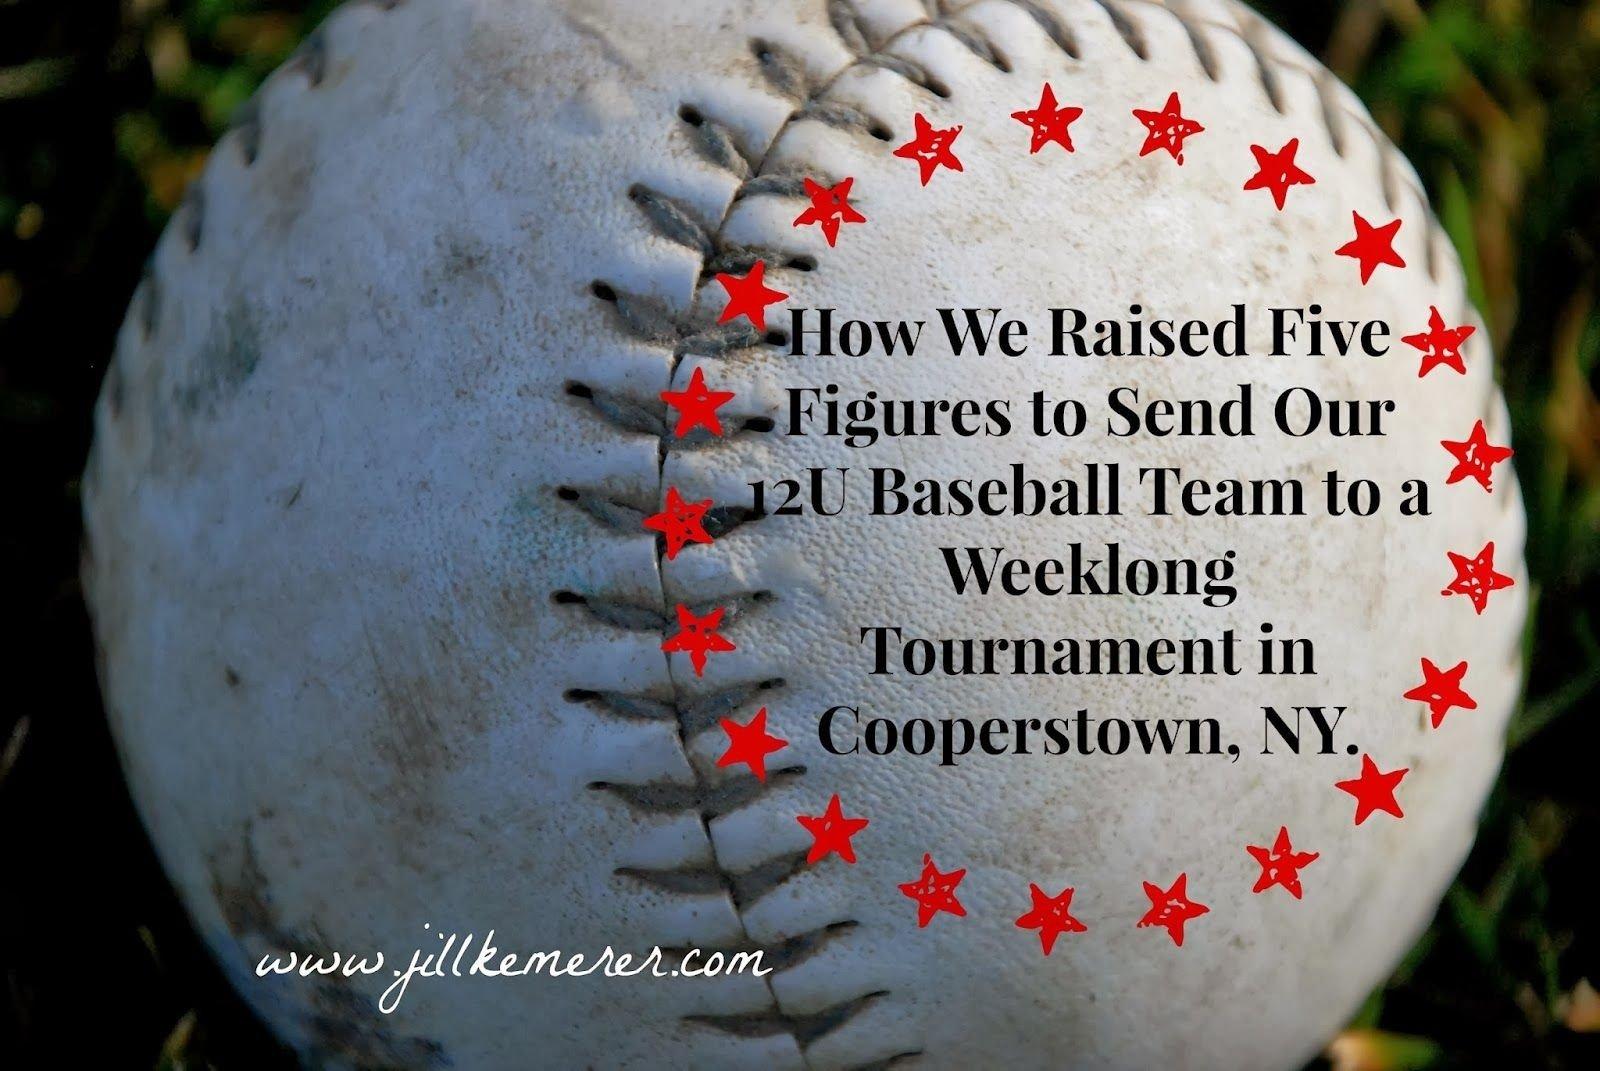 10 Cute Fundraising Ideas For Baseball Teams fundraising methods for youth sports teams jill kemerer my blog 2 2020